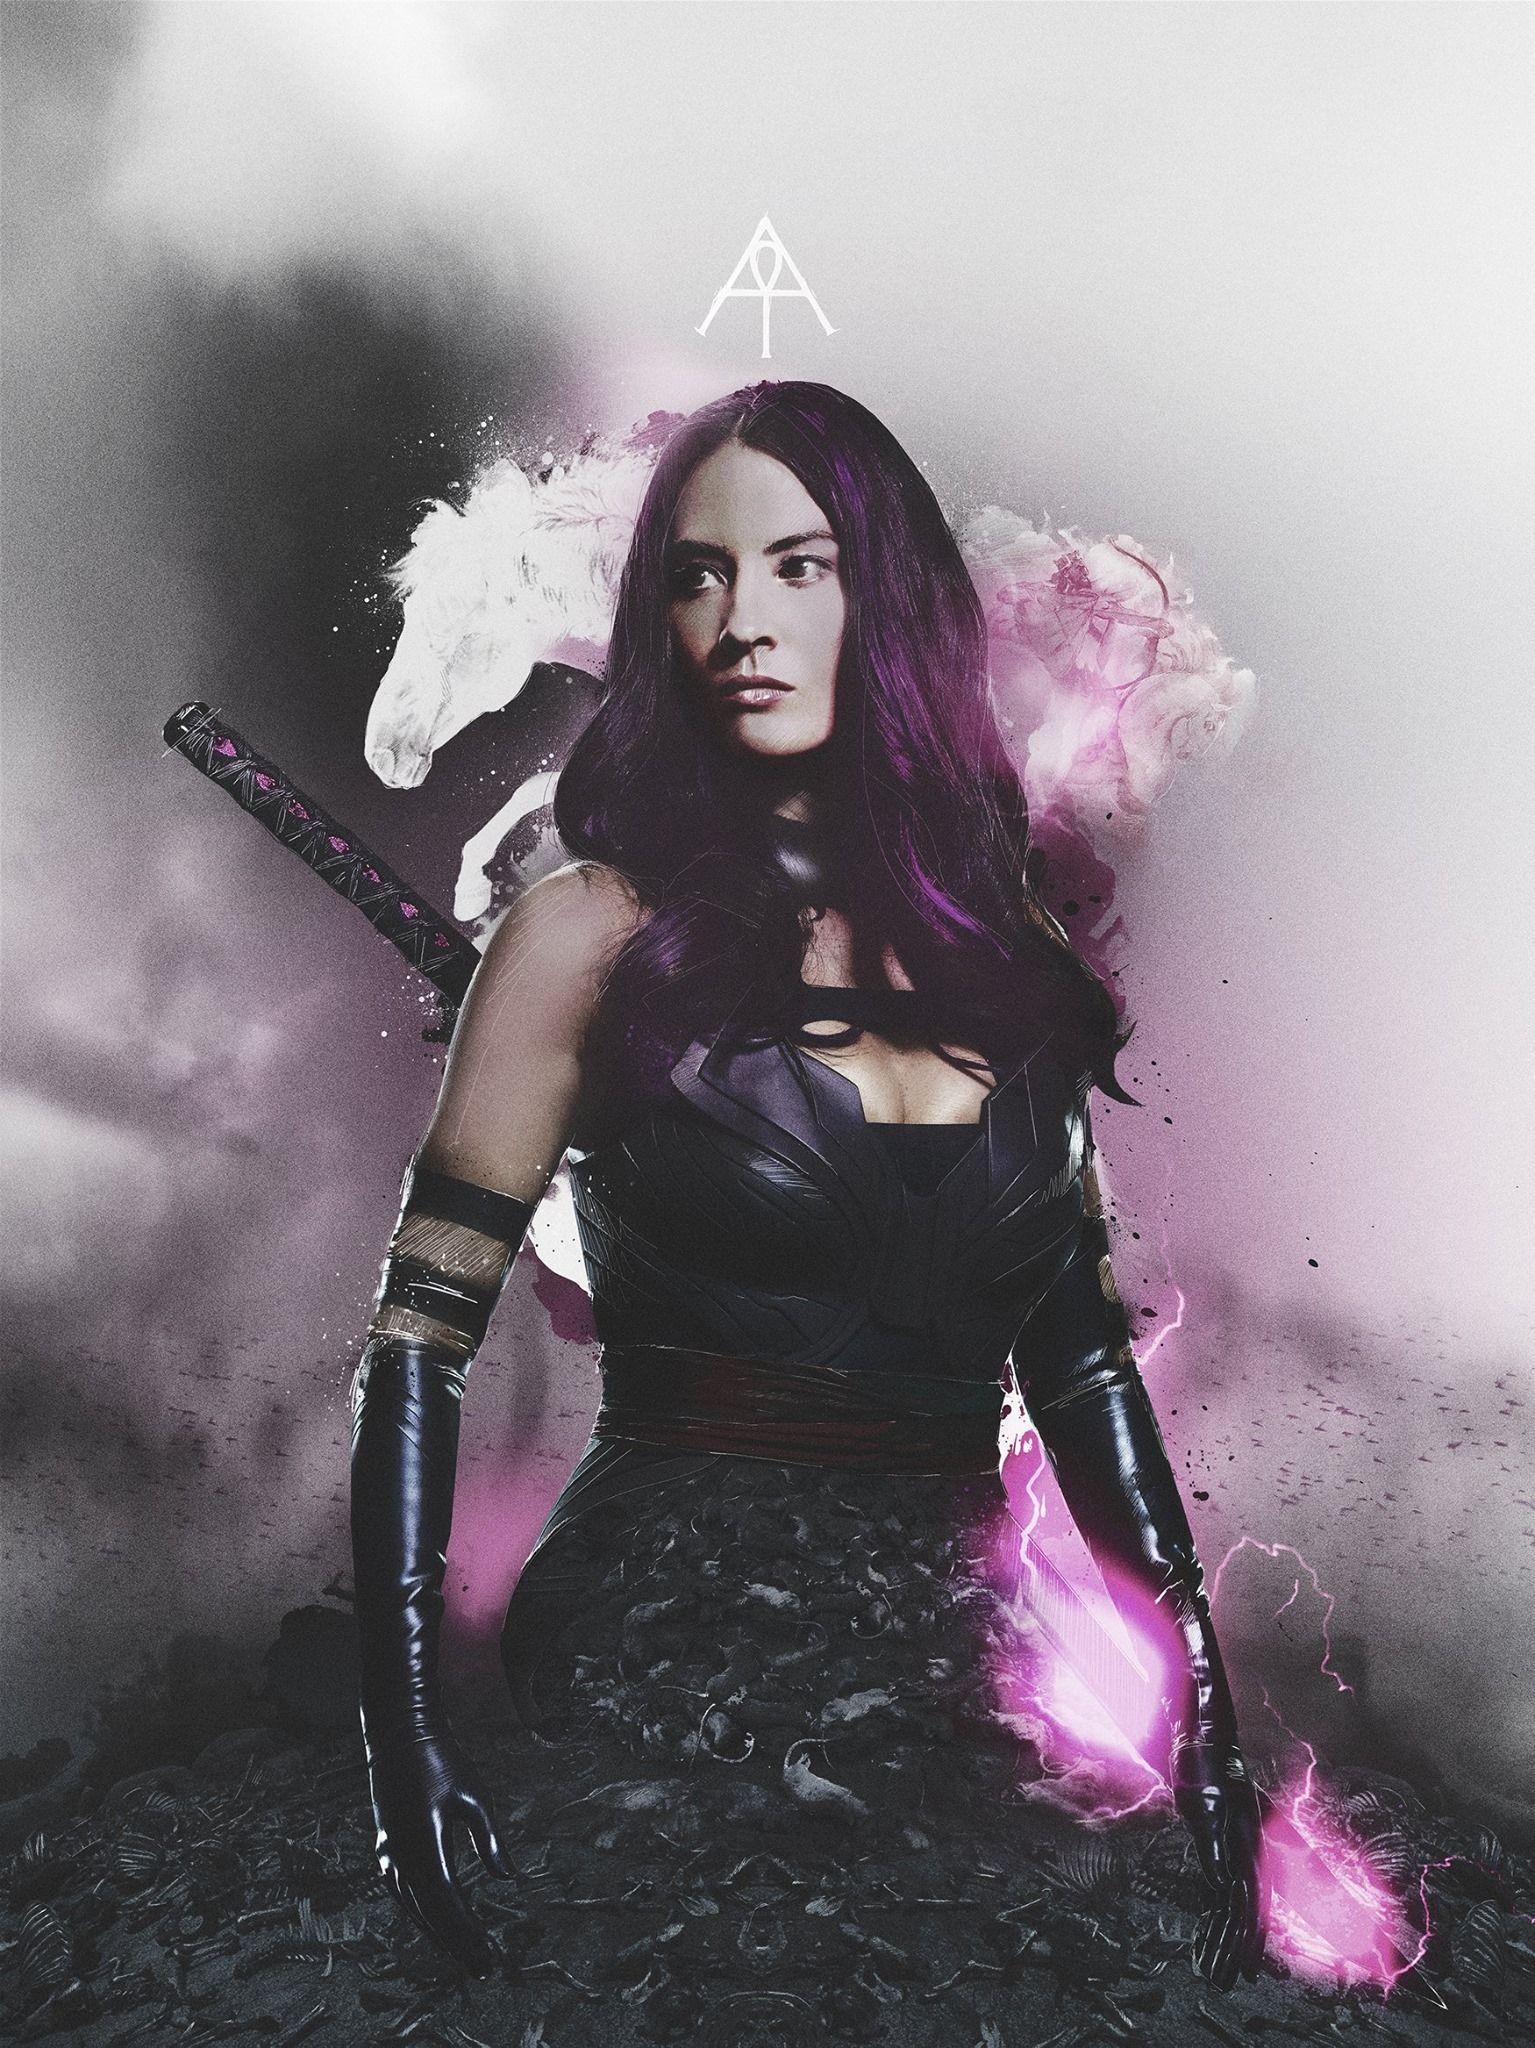 X-Mens Olivia Munn Reveals New Psylocke Photo - Movies